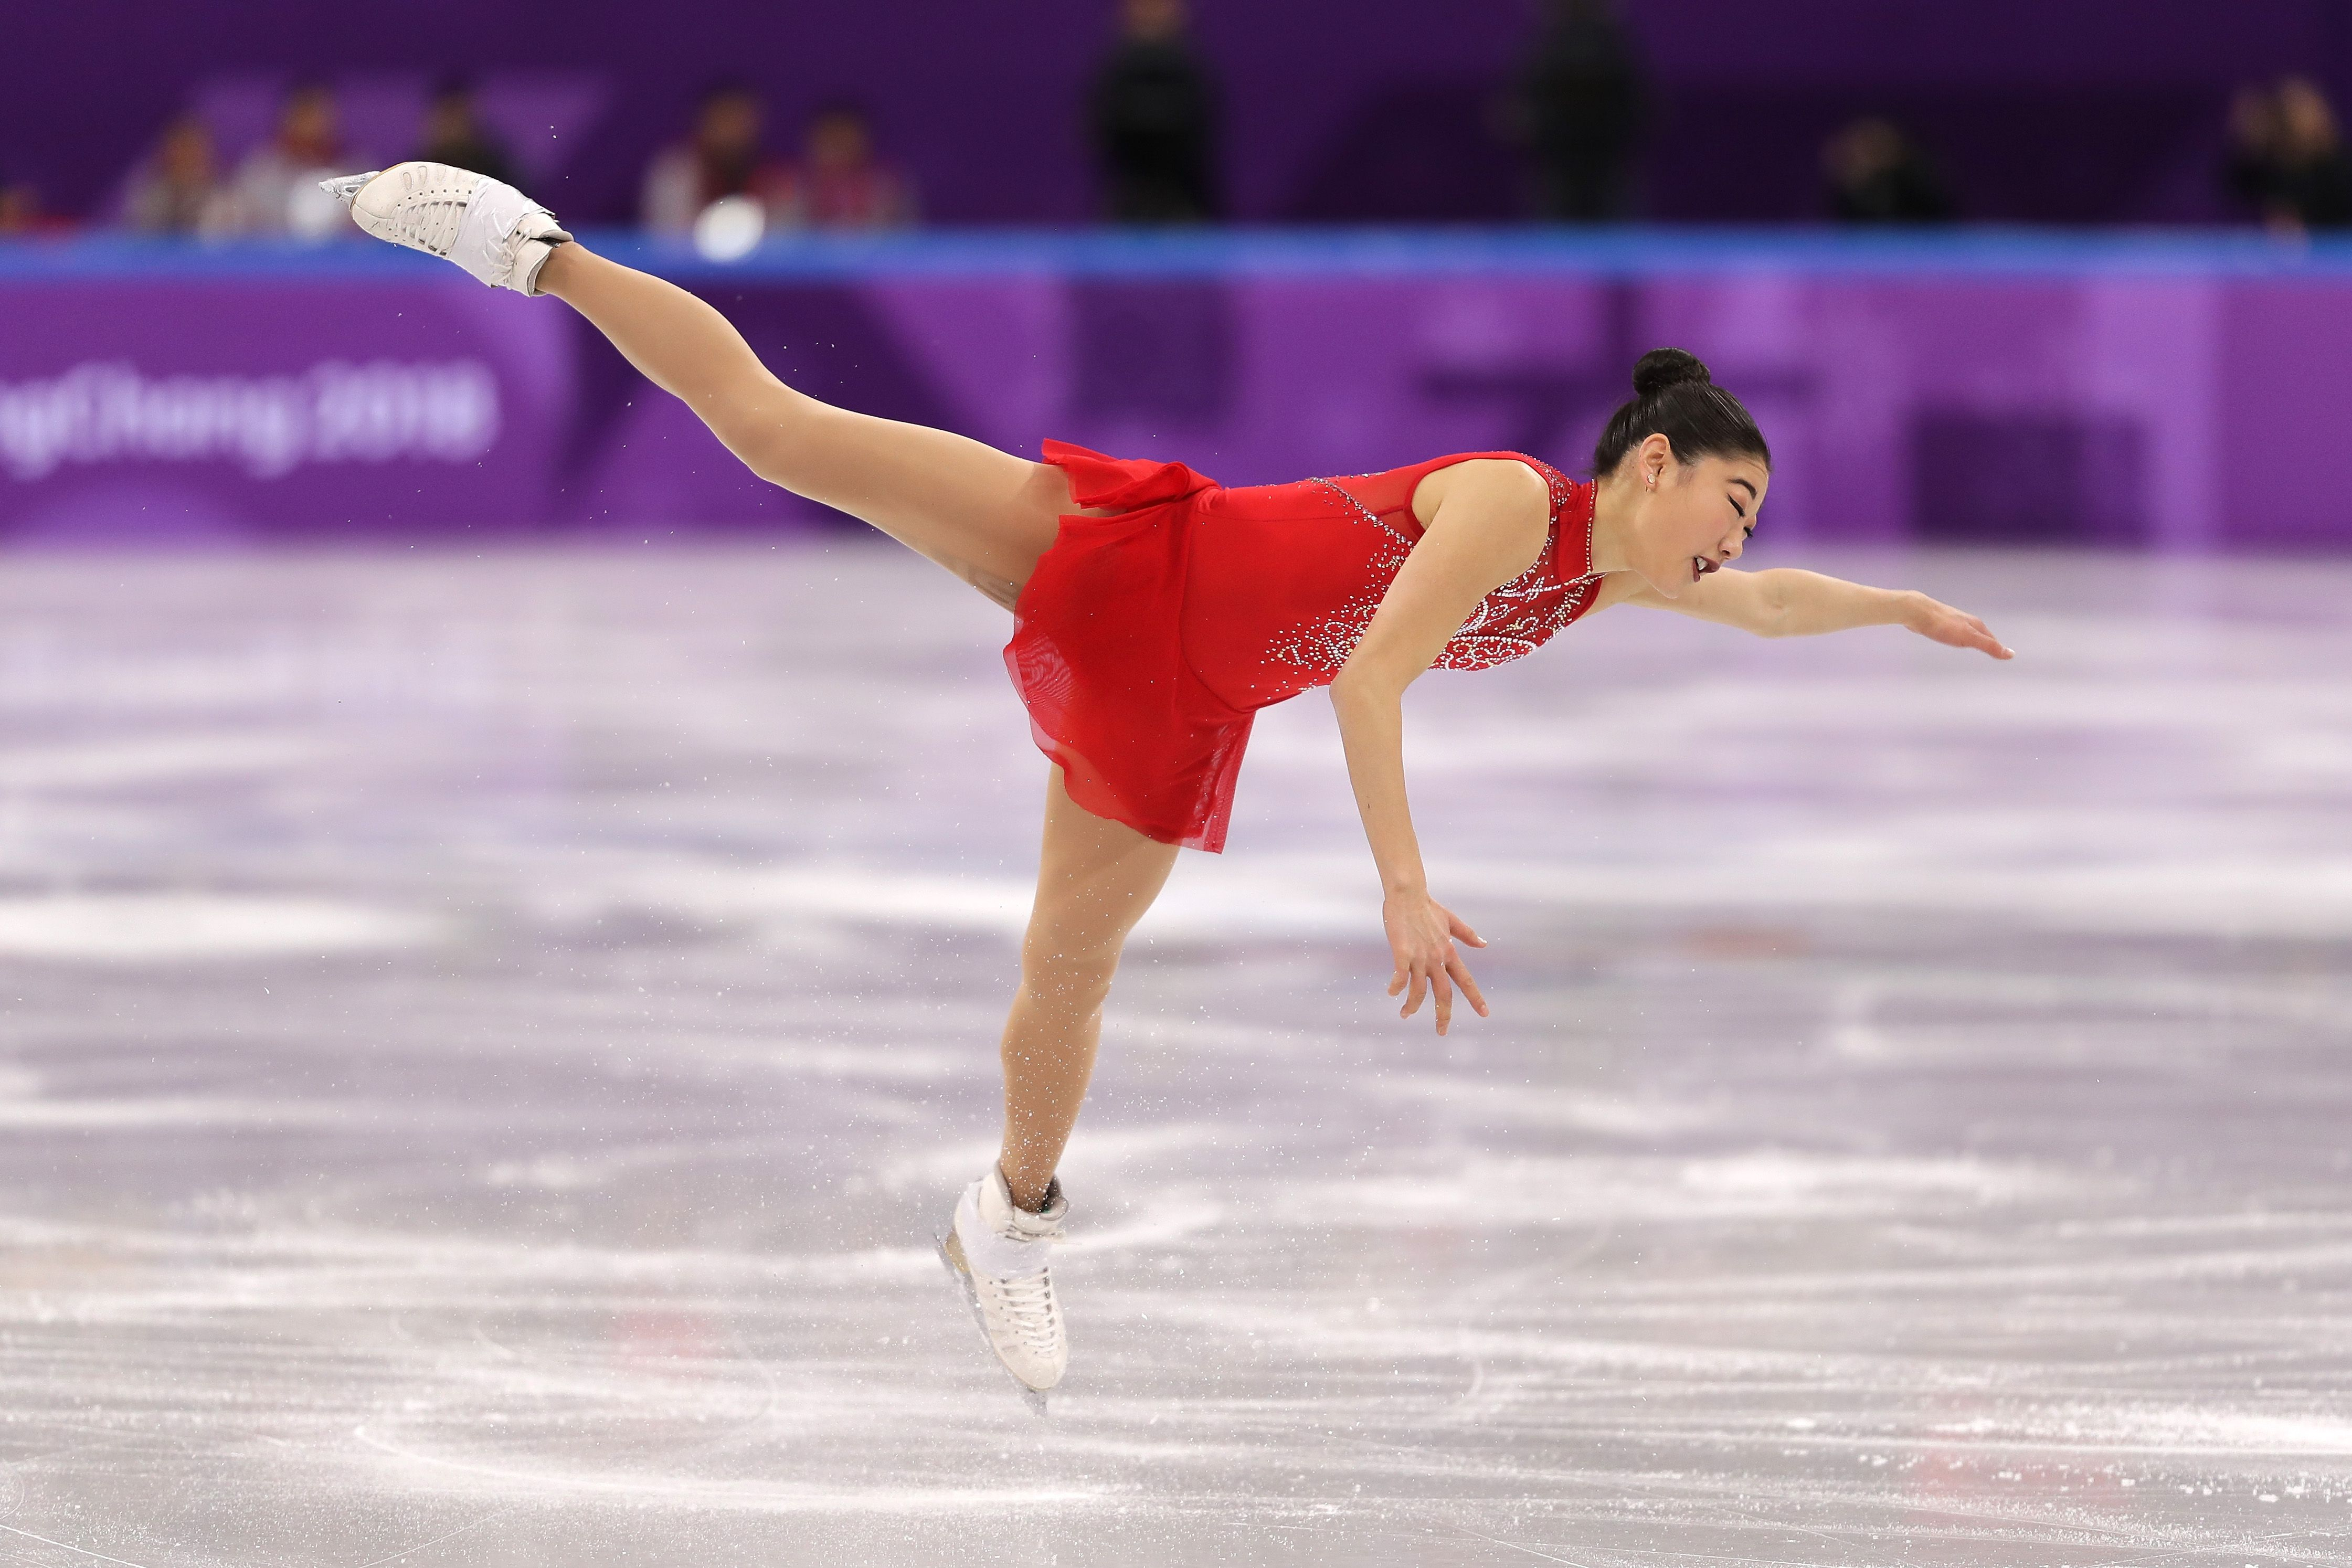 Mirai Nagasu landed a triple axel